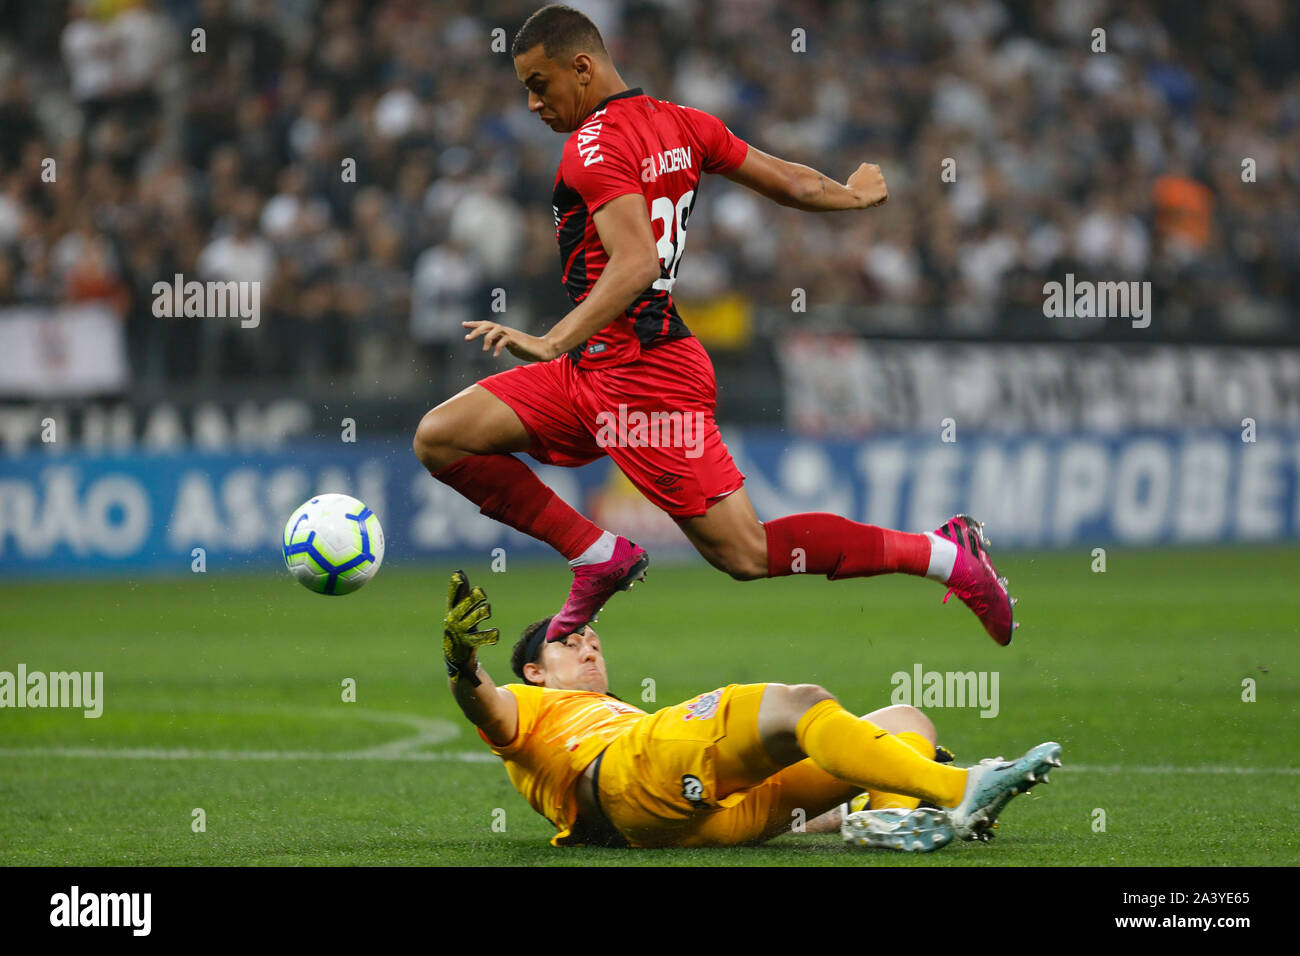 Sao Paulo Sp 10 10 2019 Corinthians X Athletico Paranaense Thonny Anderson Of Athletico Pr And Cassio